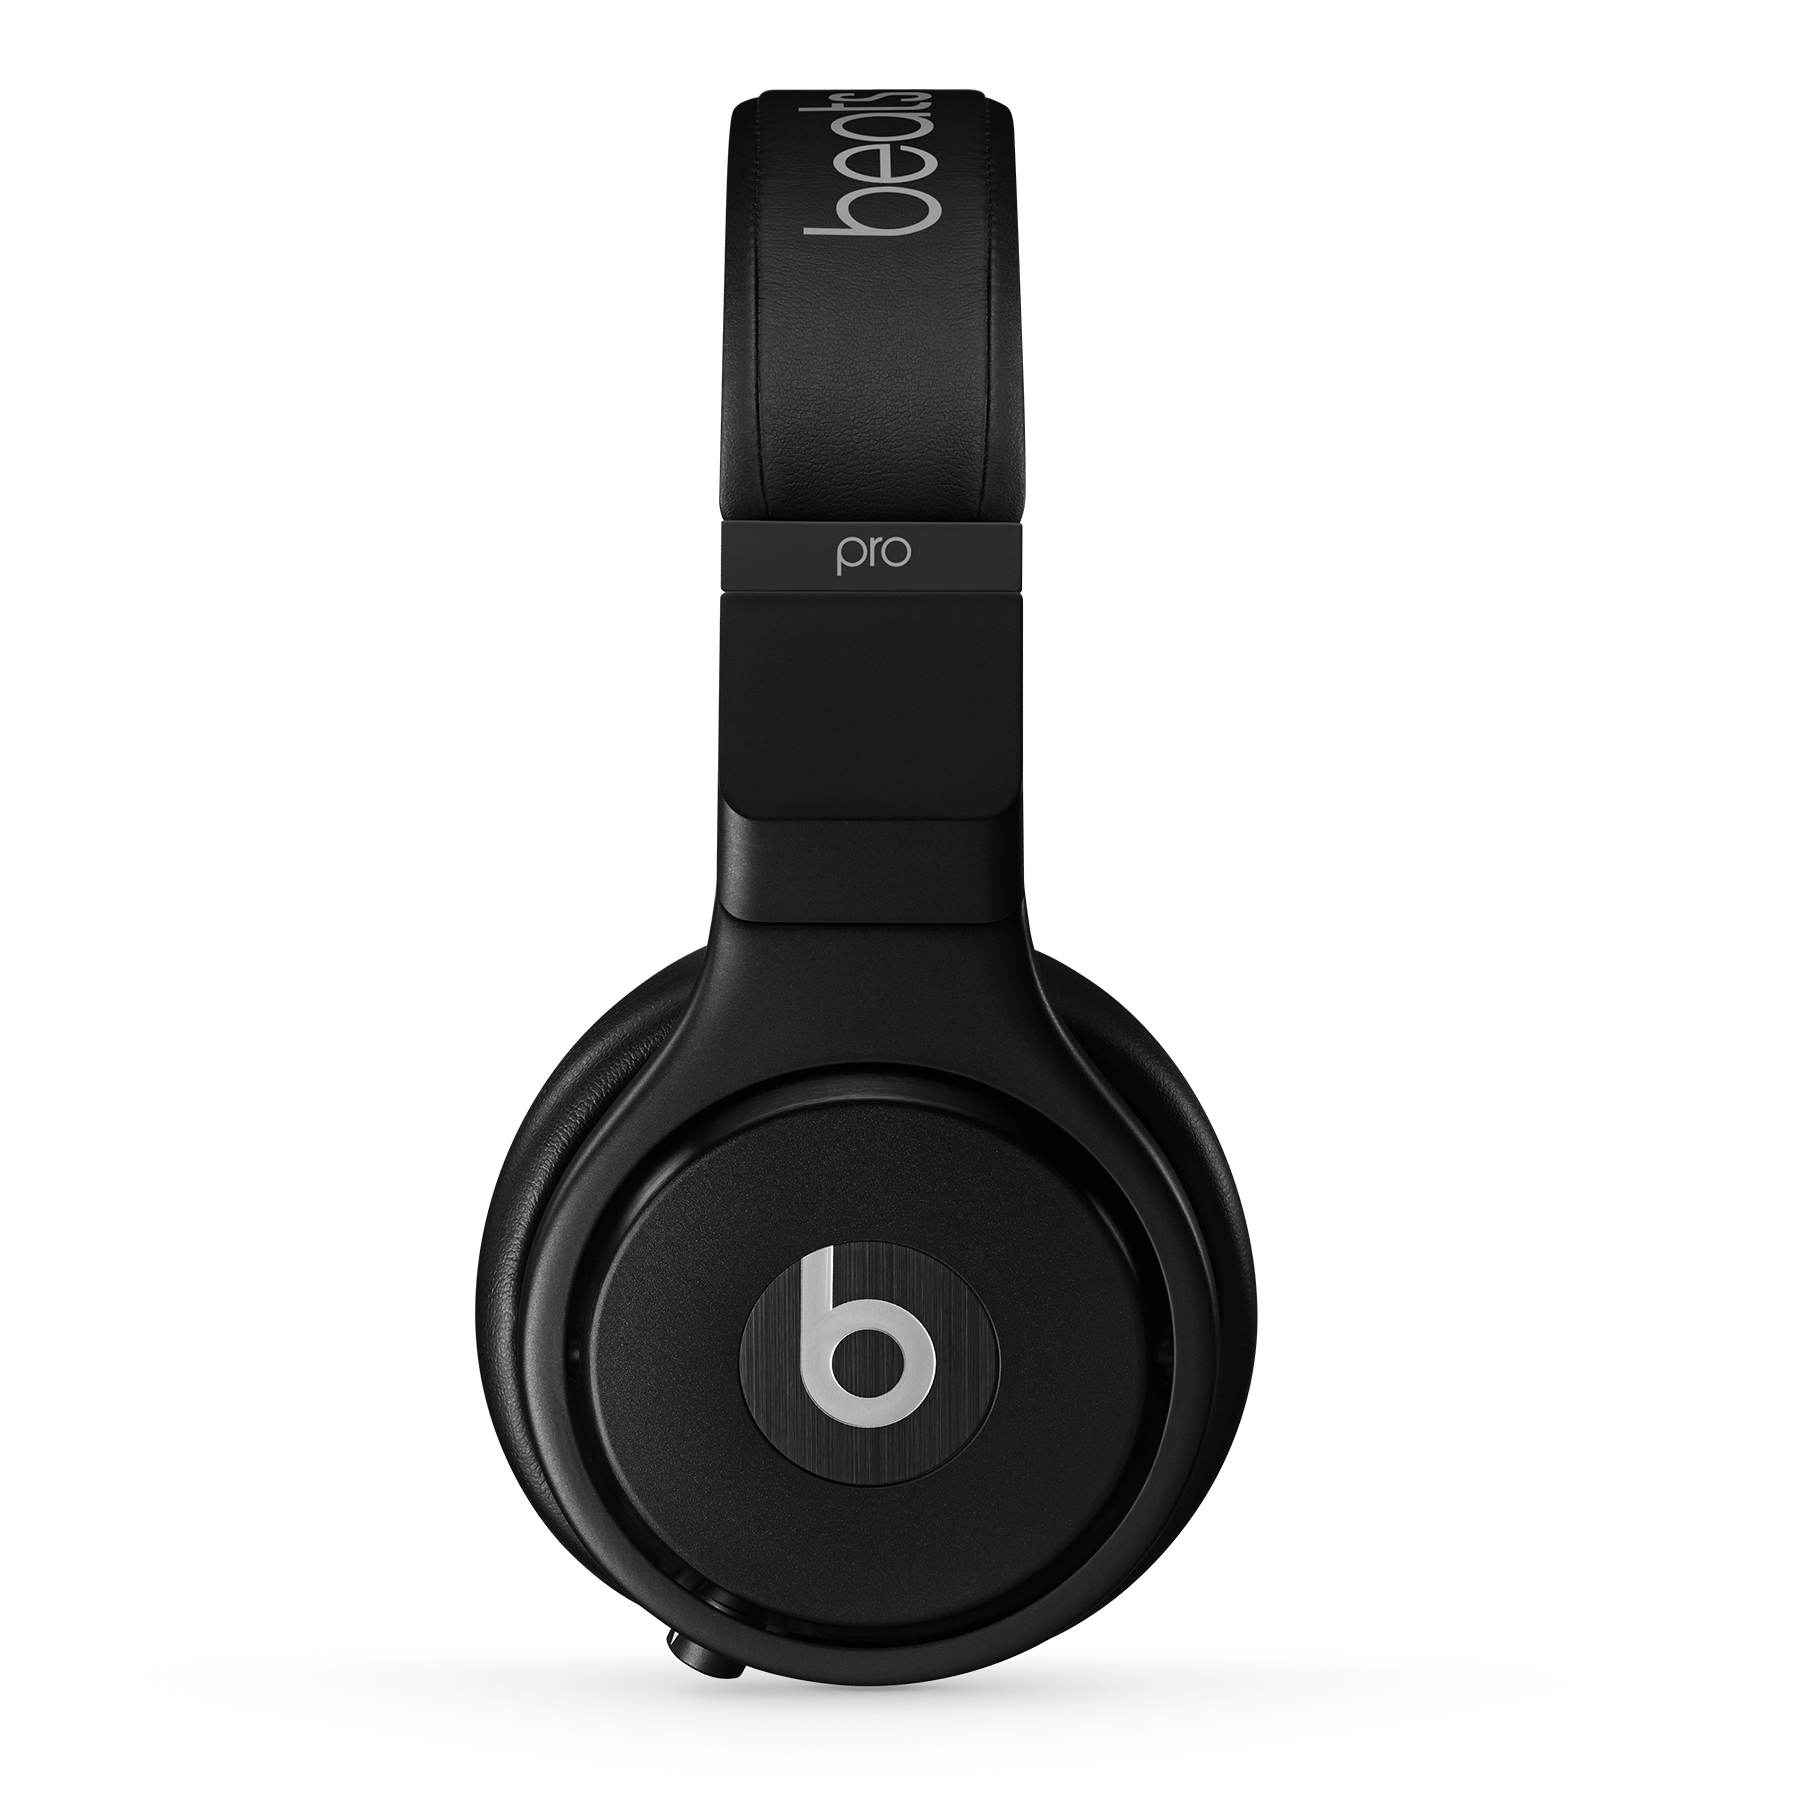 Beats wireless headphones by dre - headphones lightning connector beats